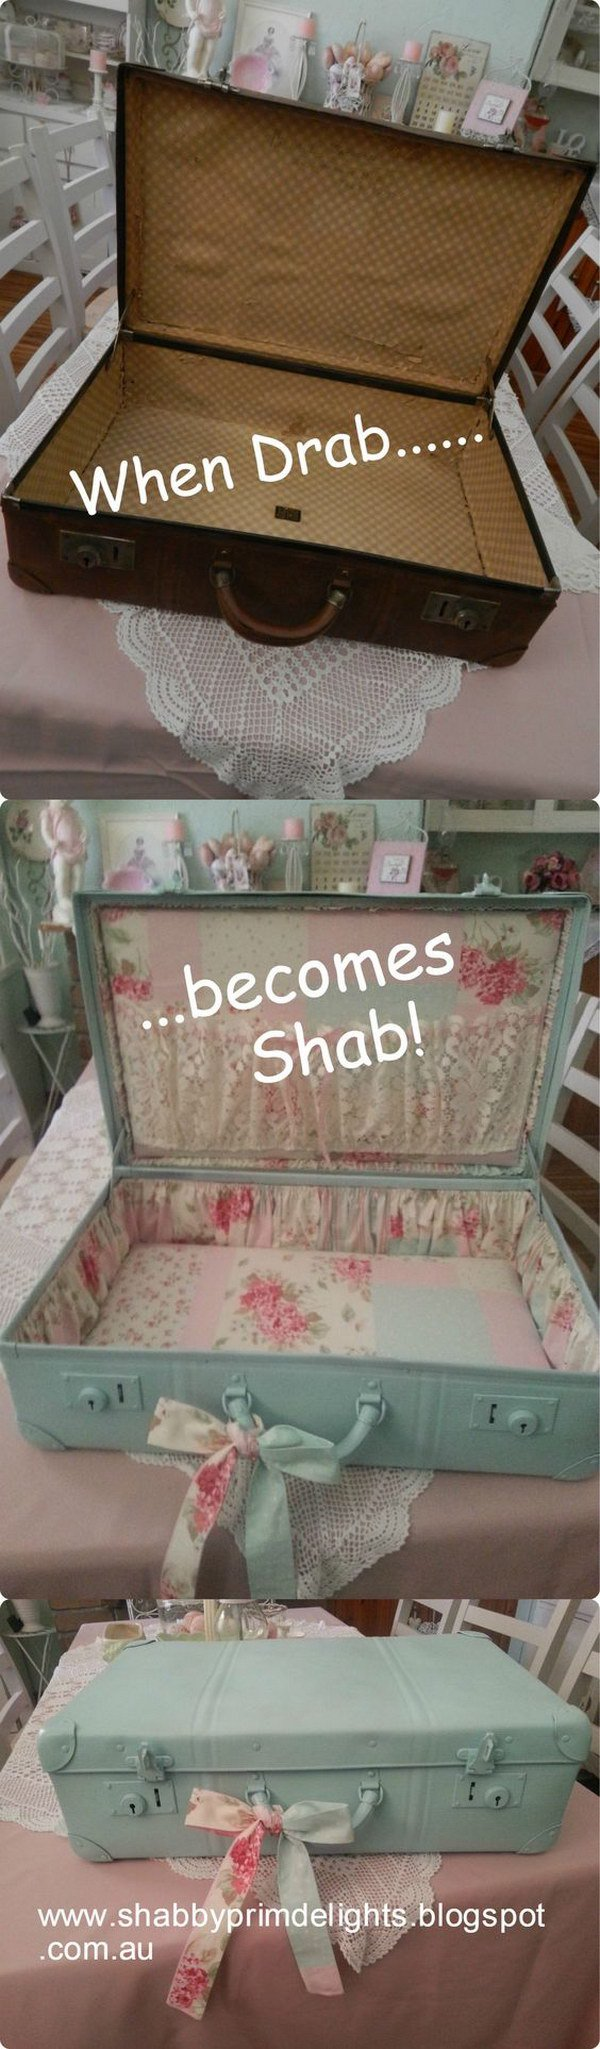 24-diy-shabby-chic-furniture-ideas-tutorials